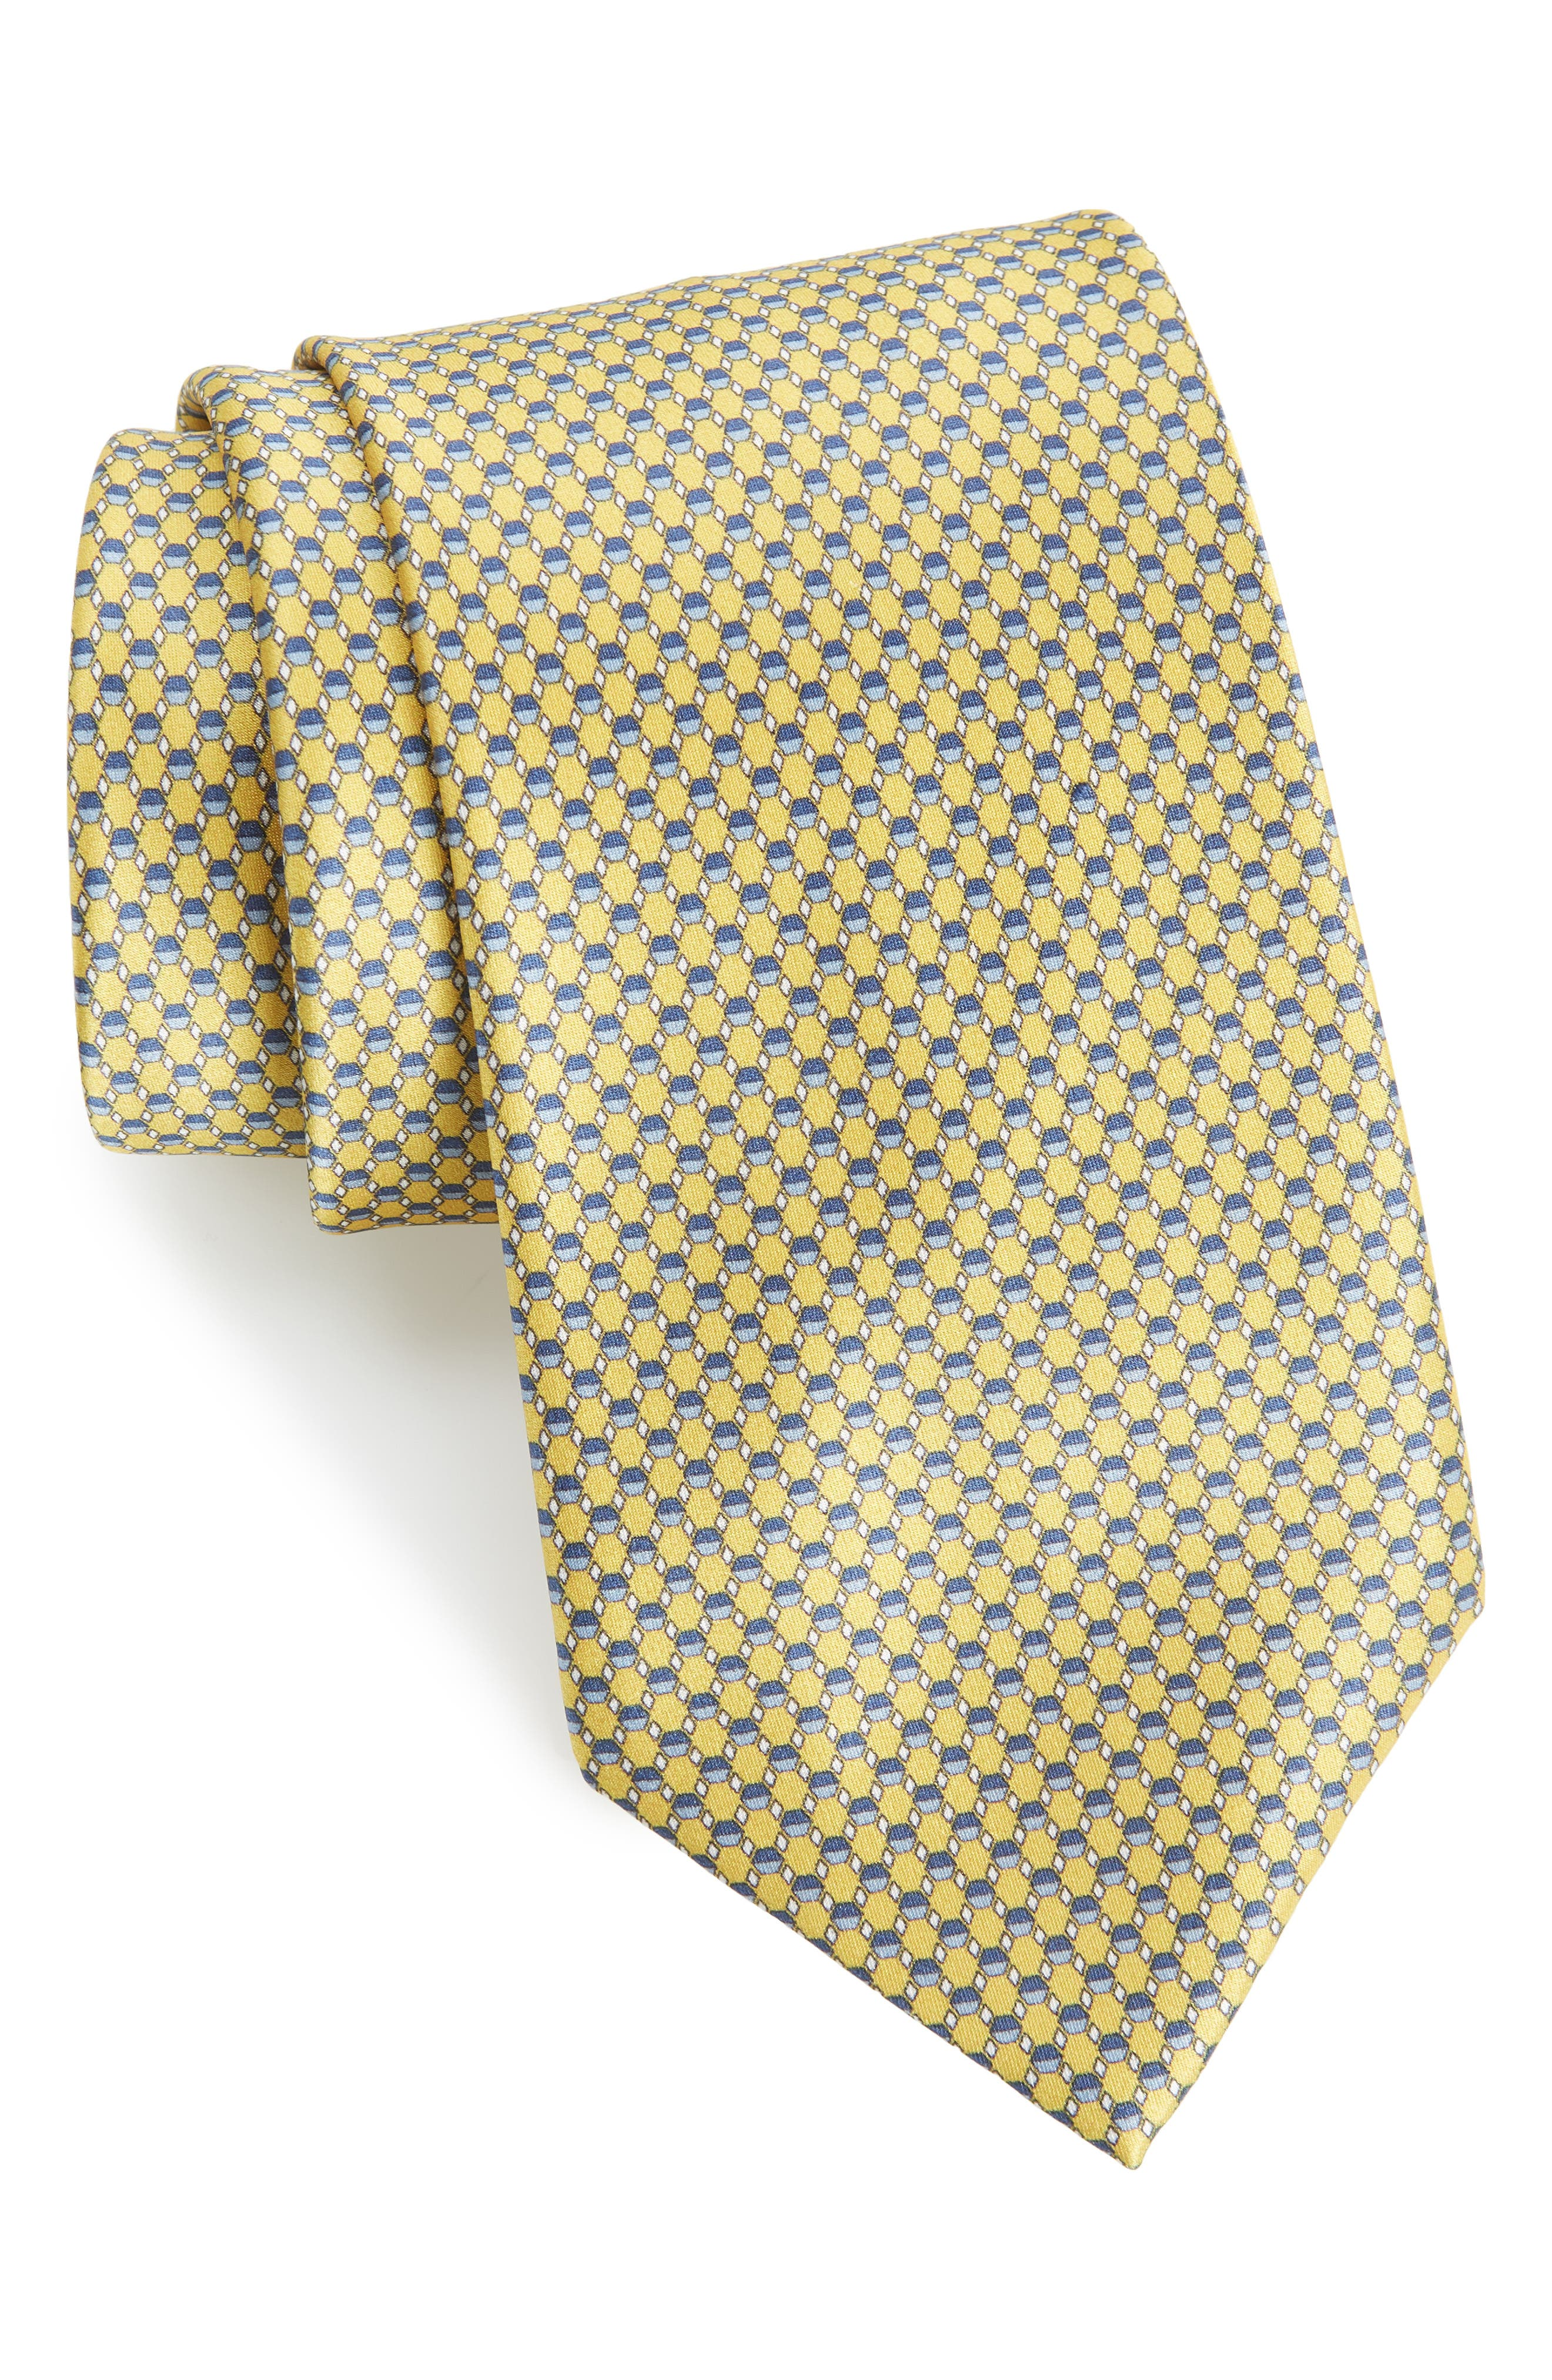 Geometric Silk Tie,                         Main,                         color, YELLOW/ BLUE